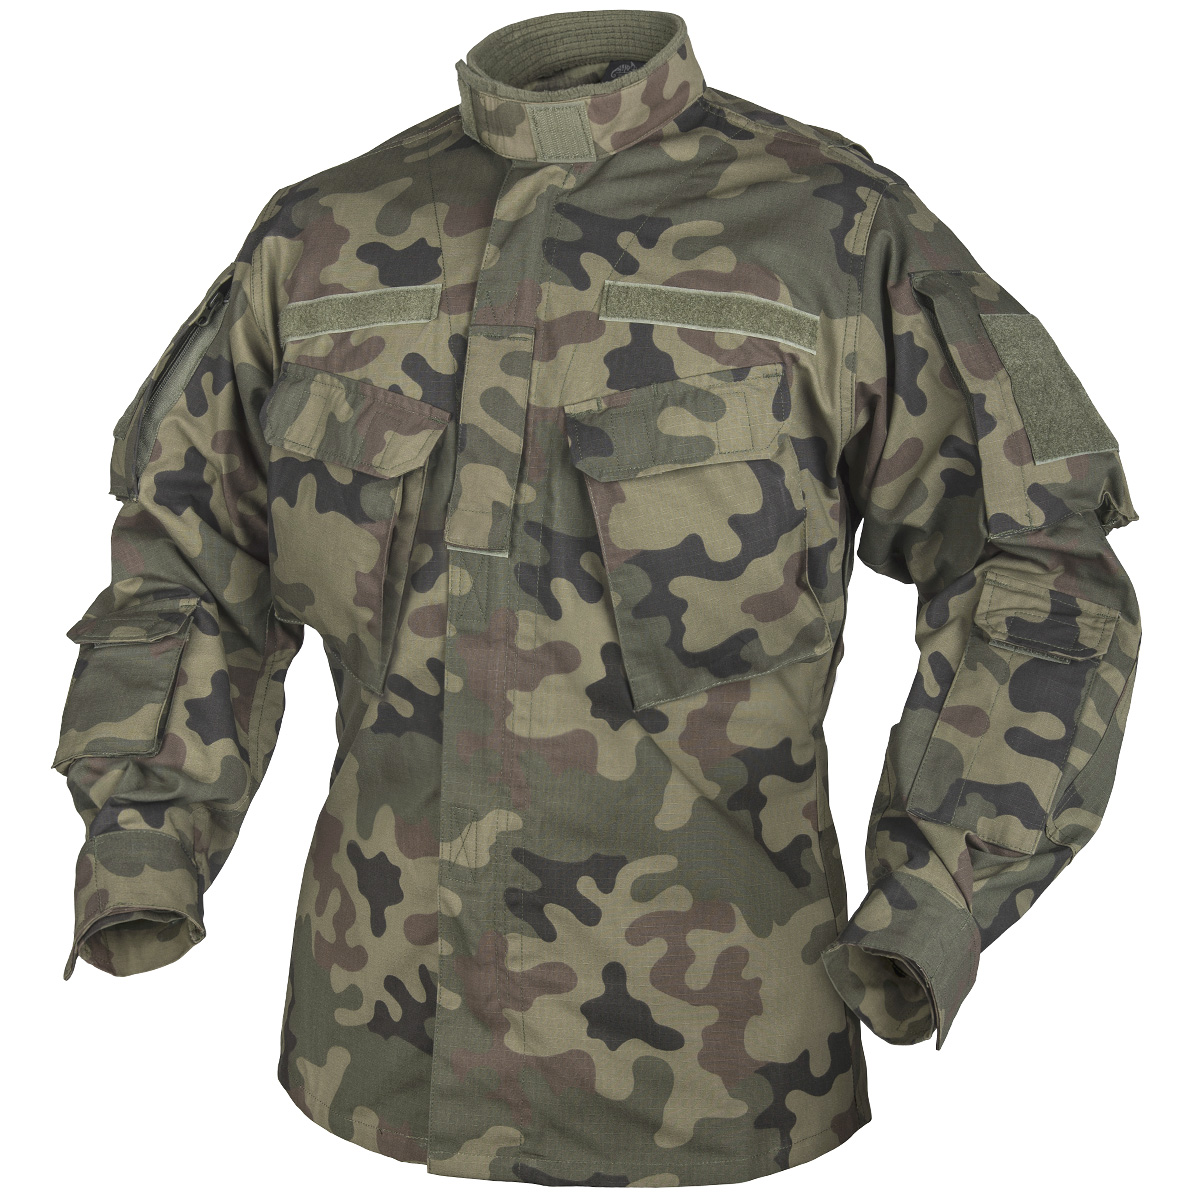 helikon army tactical jacket cpu combat mens shirt airsoft polish woodland camo ebay. Black Bedroom Furniture Sets. Home Design Ideas